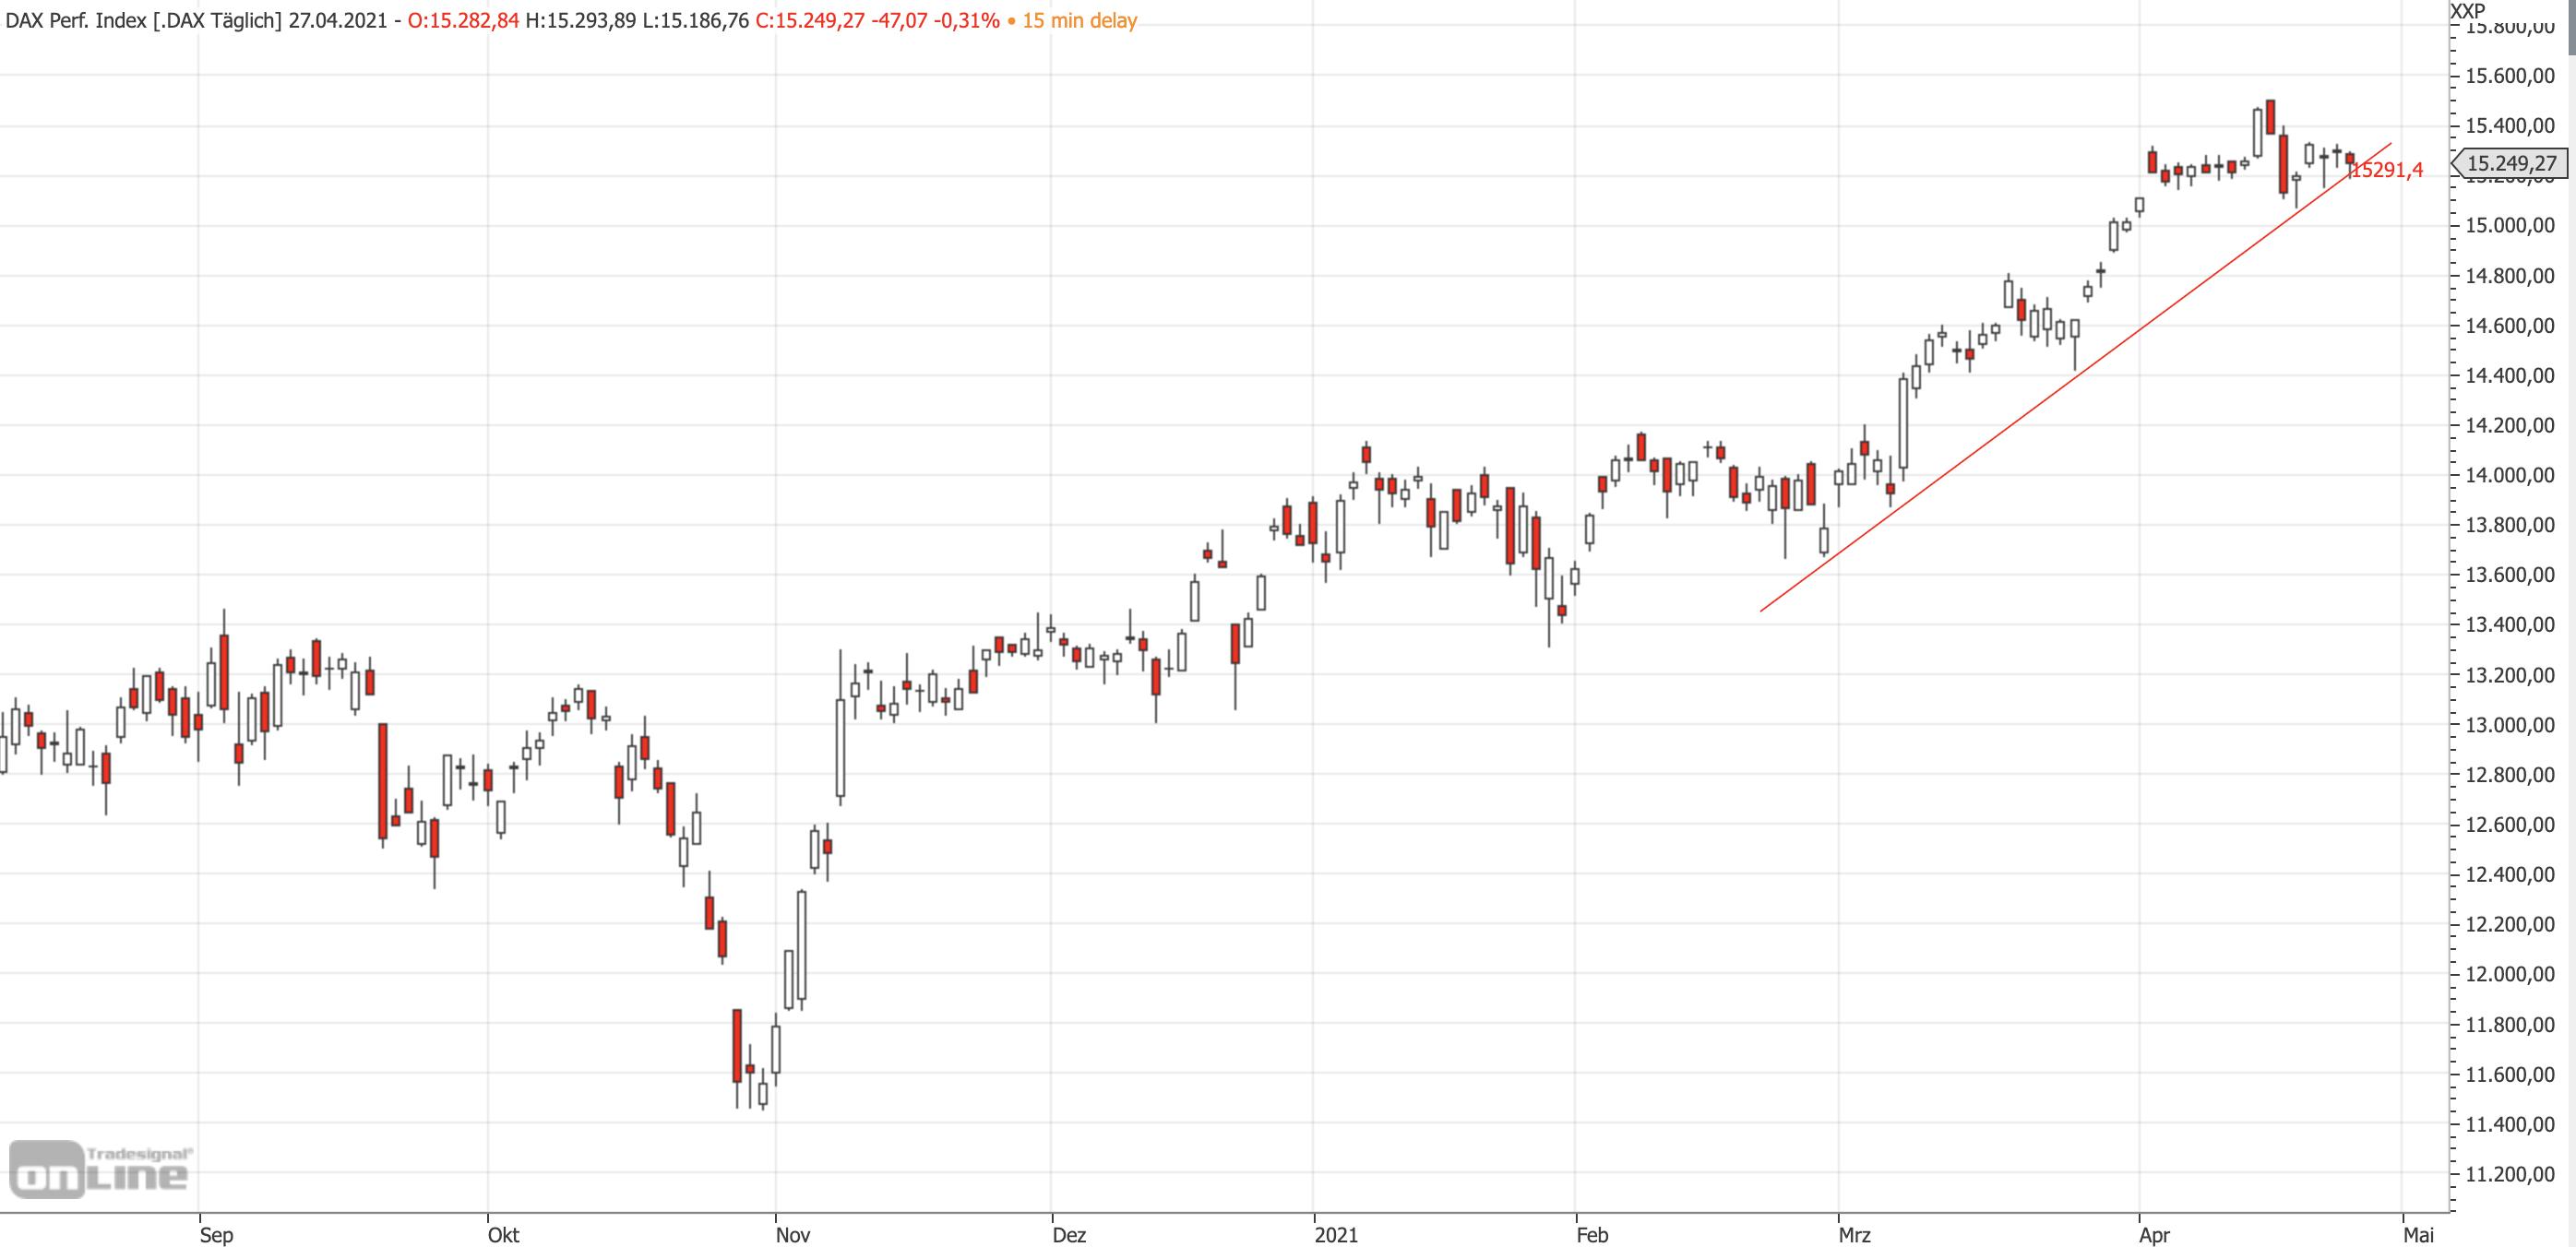 Mittelfristiger DAX-Chart am 27.04.2021